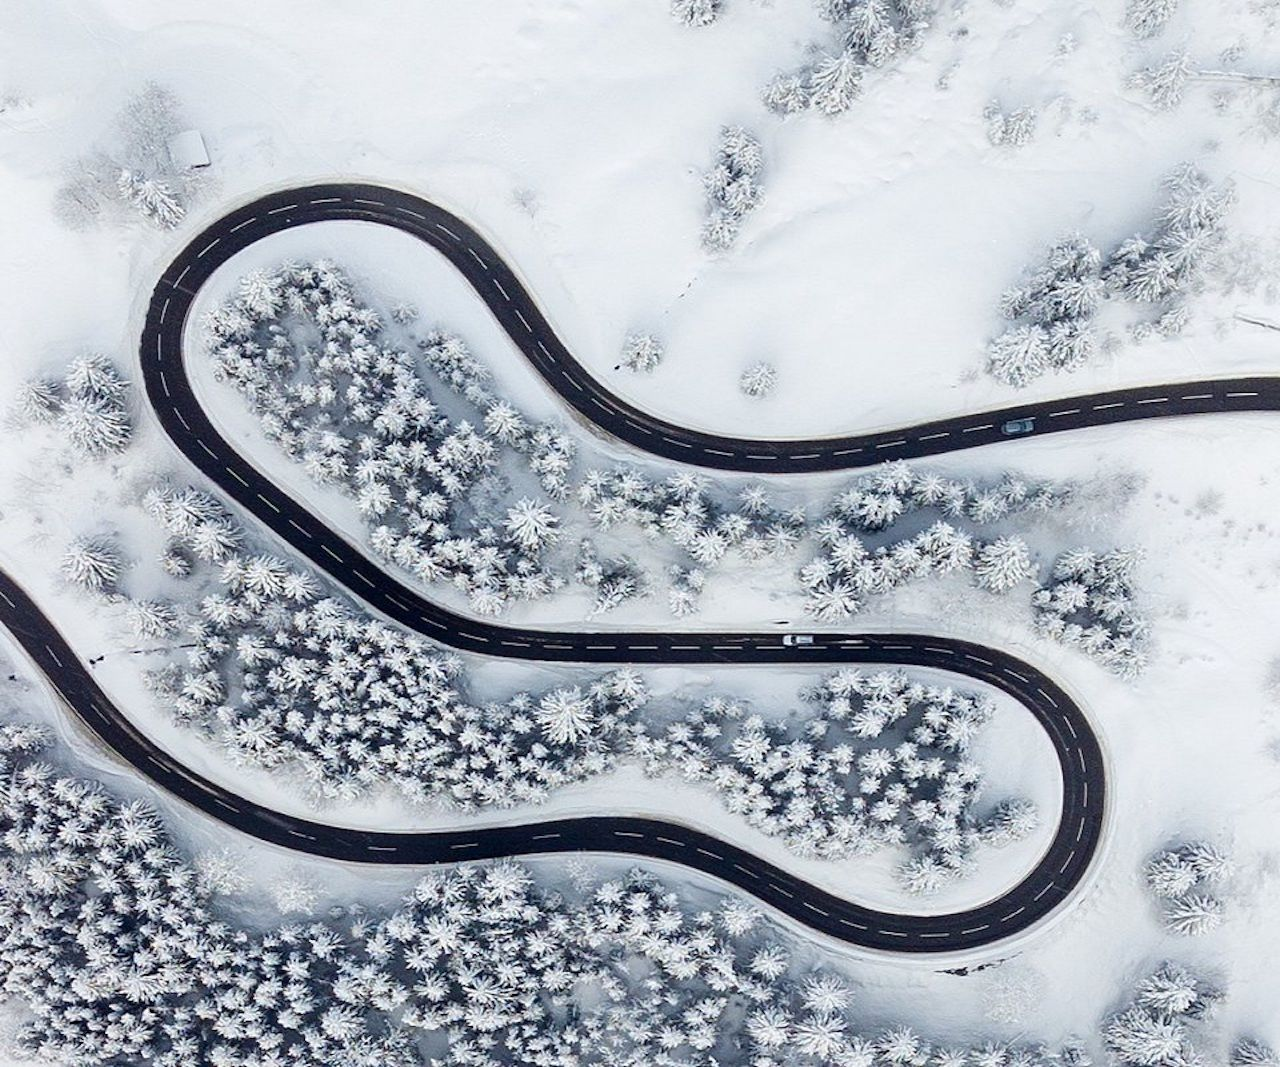 road_in_winter